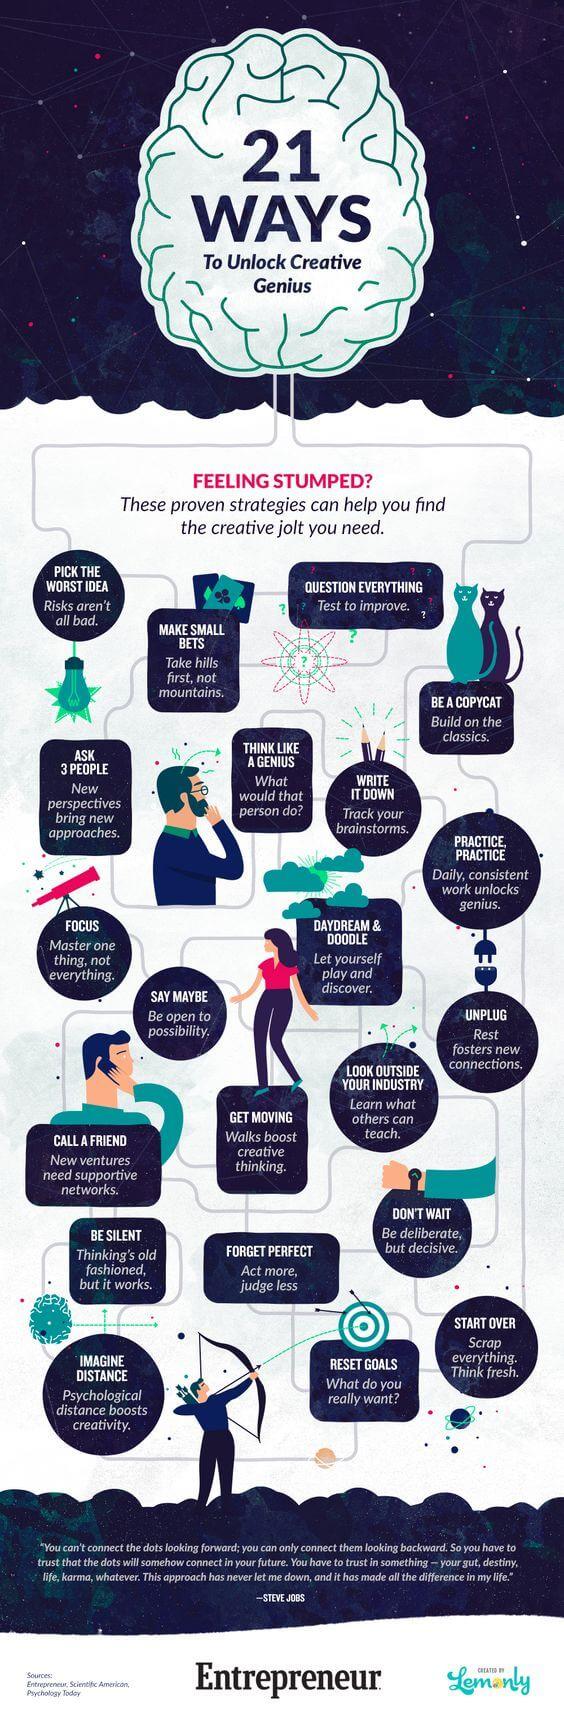 21 Ways to Unlock Creative Genius In You